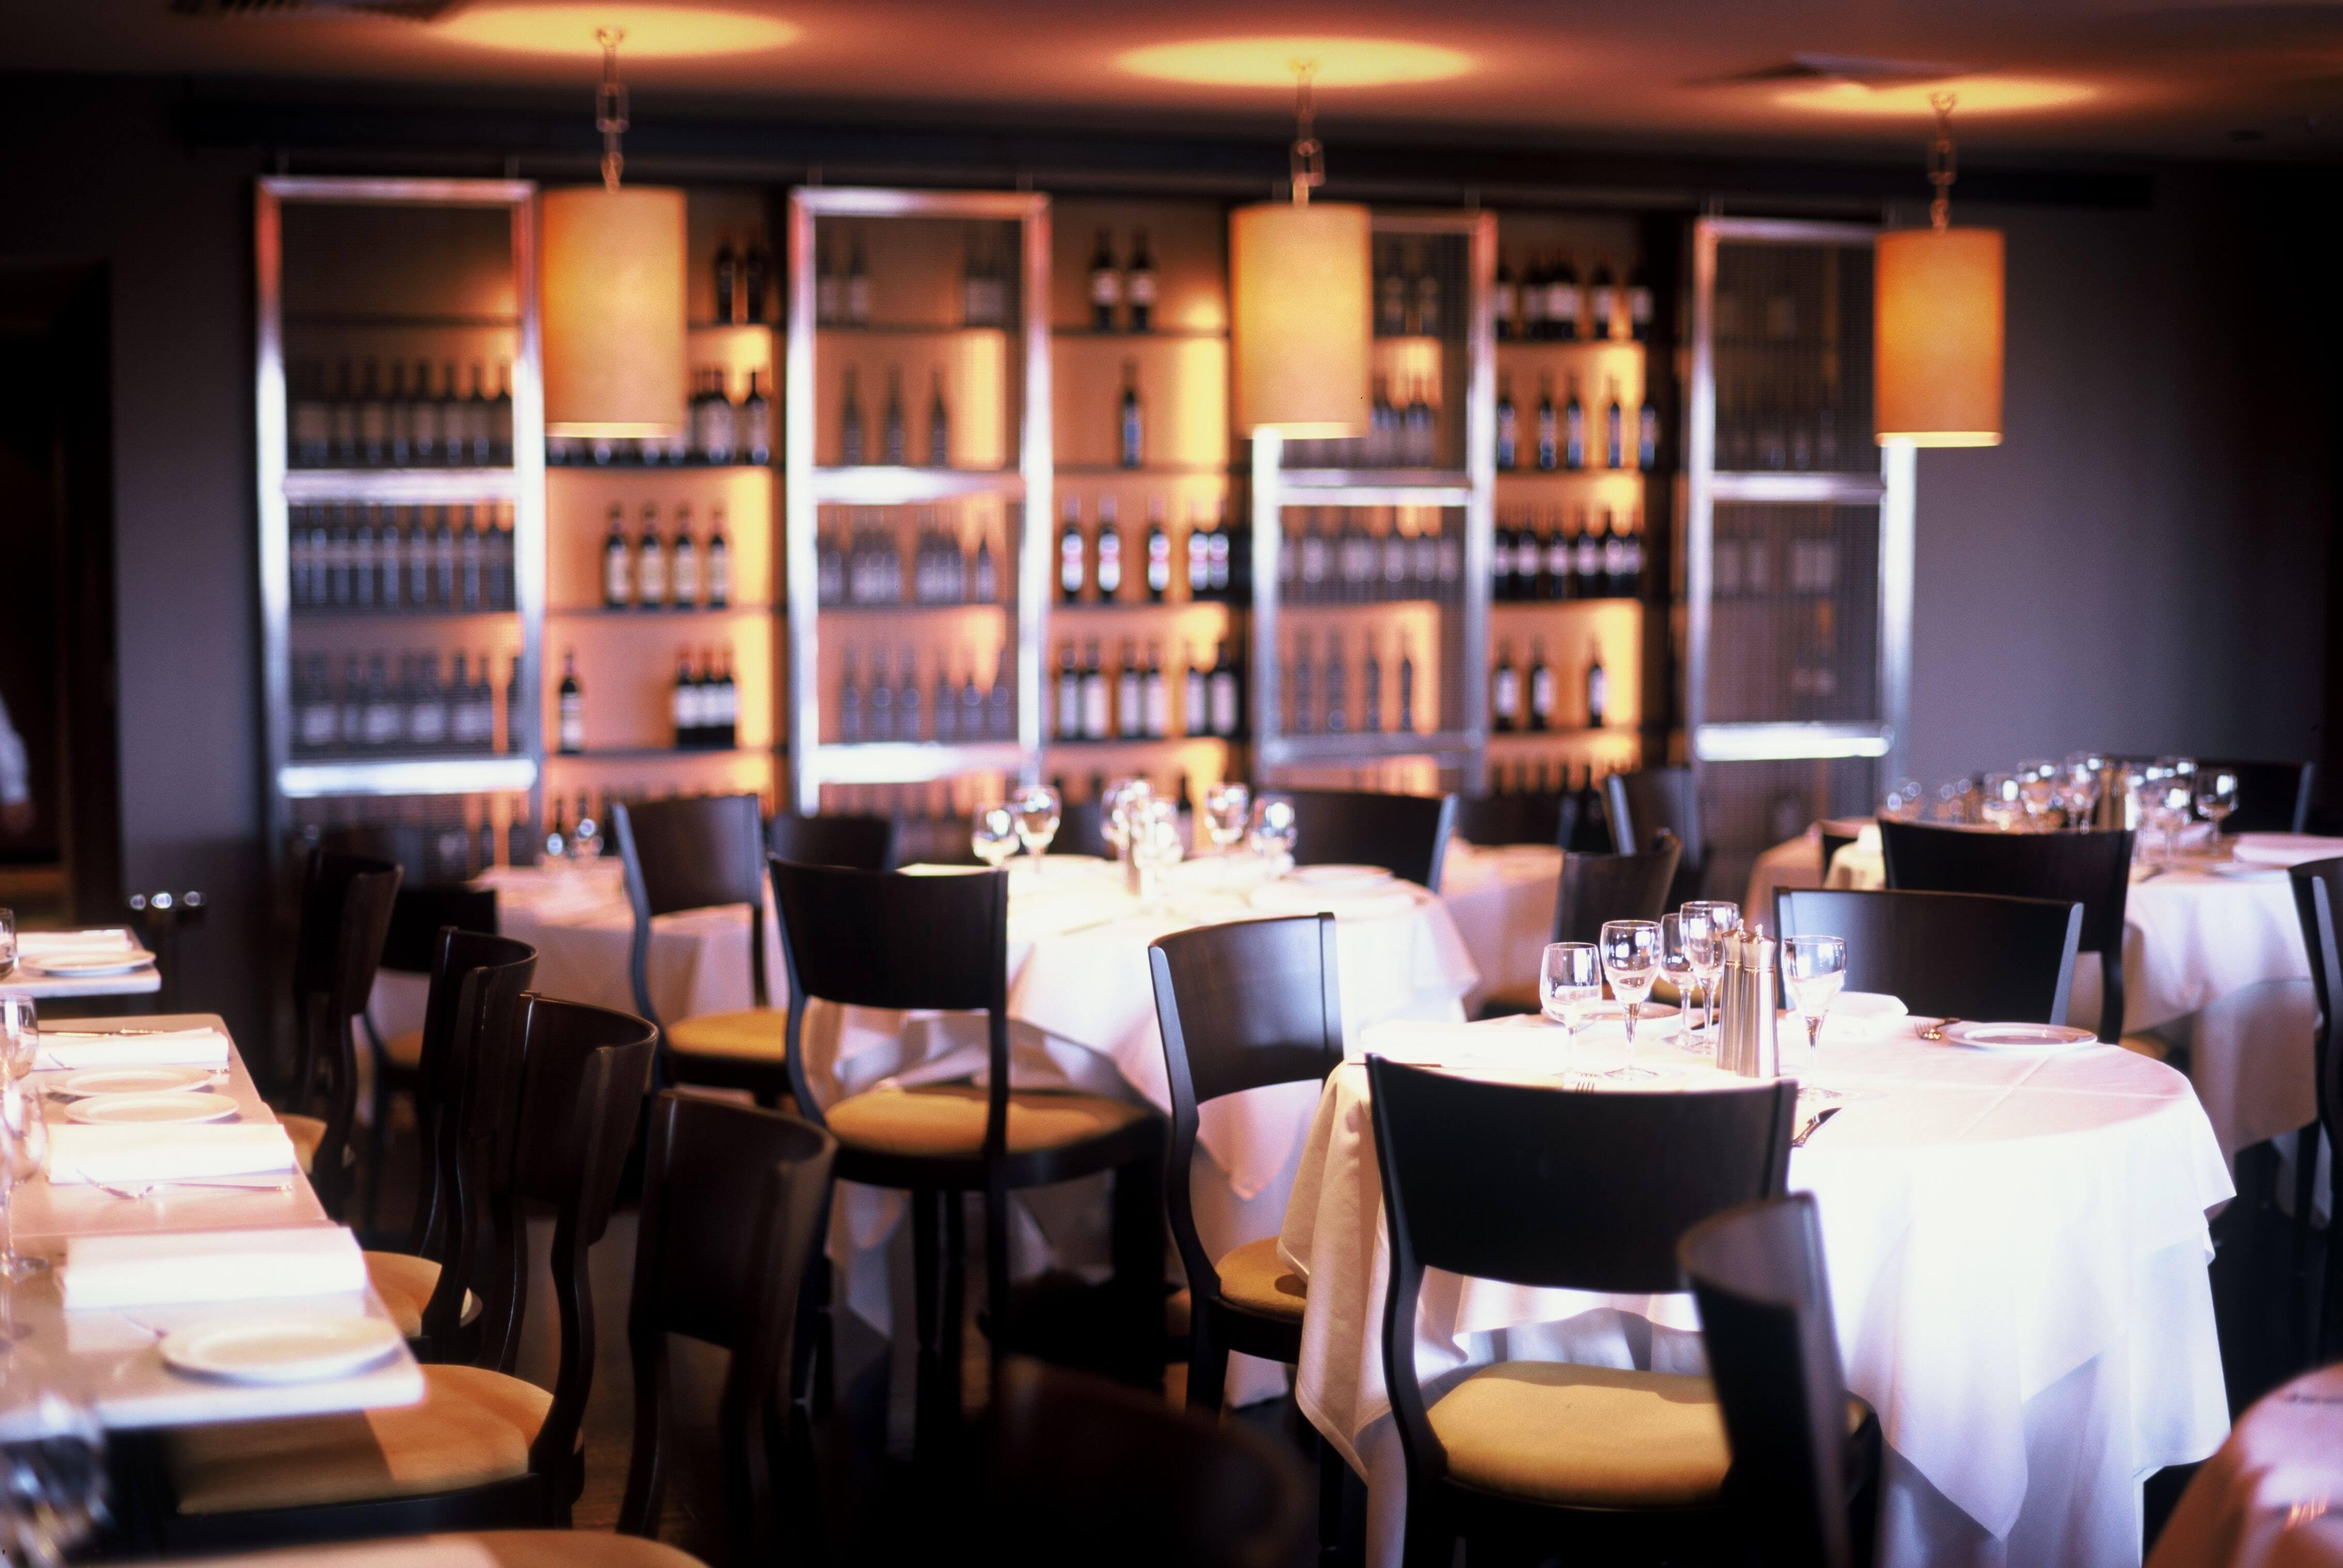 Sala da pranzo di ristorante